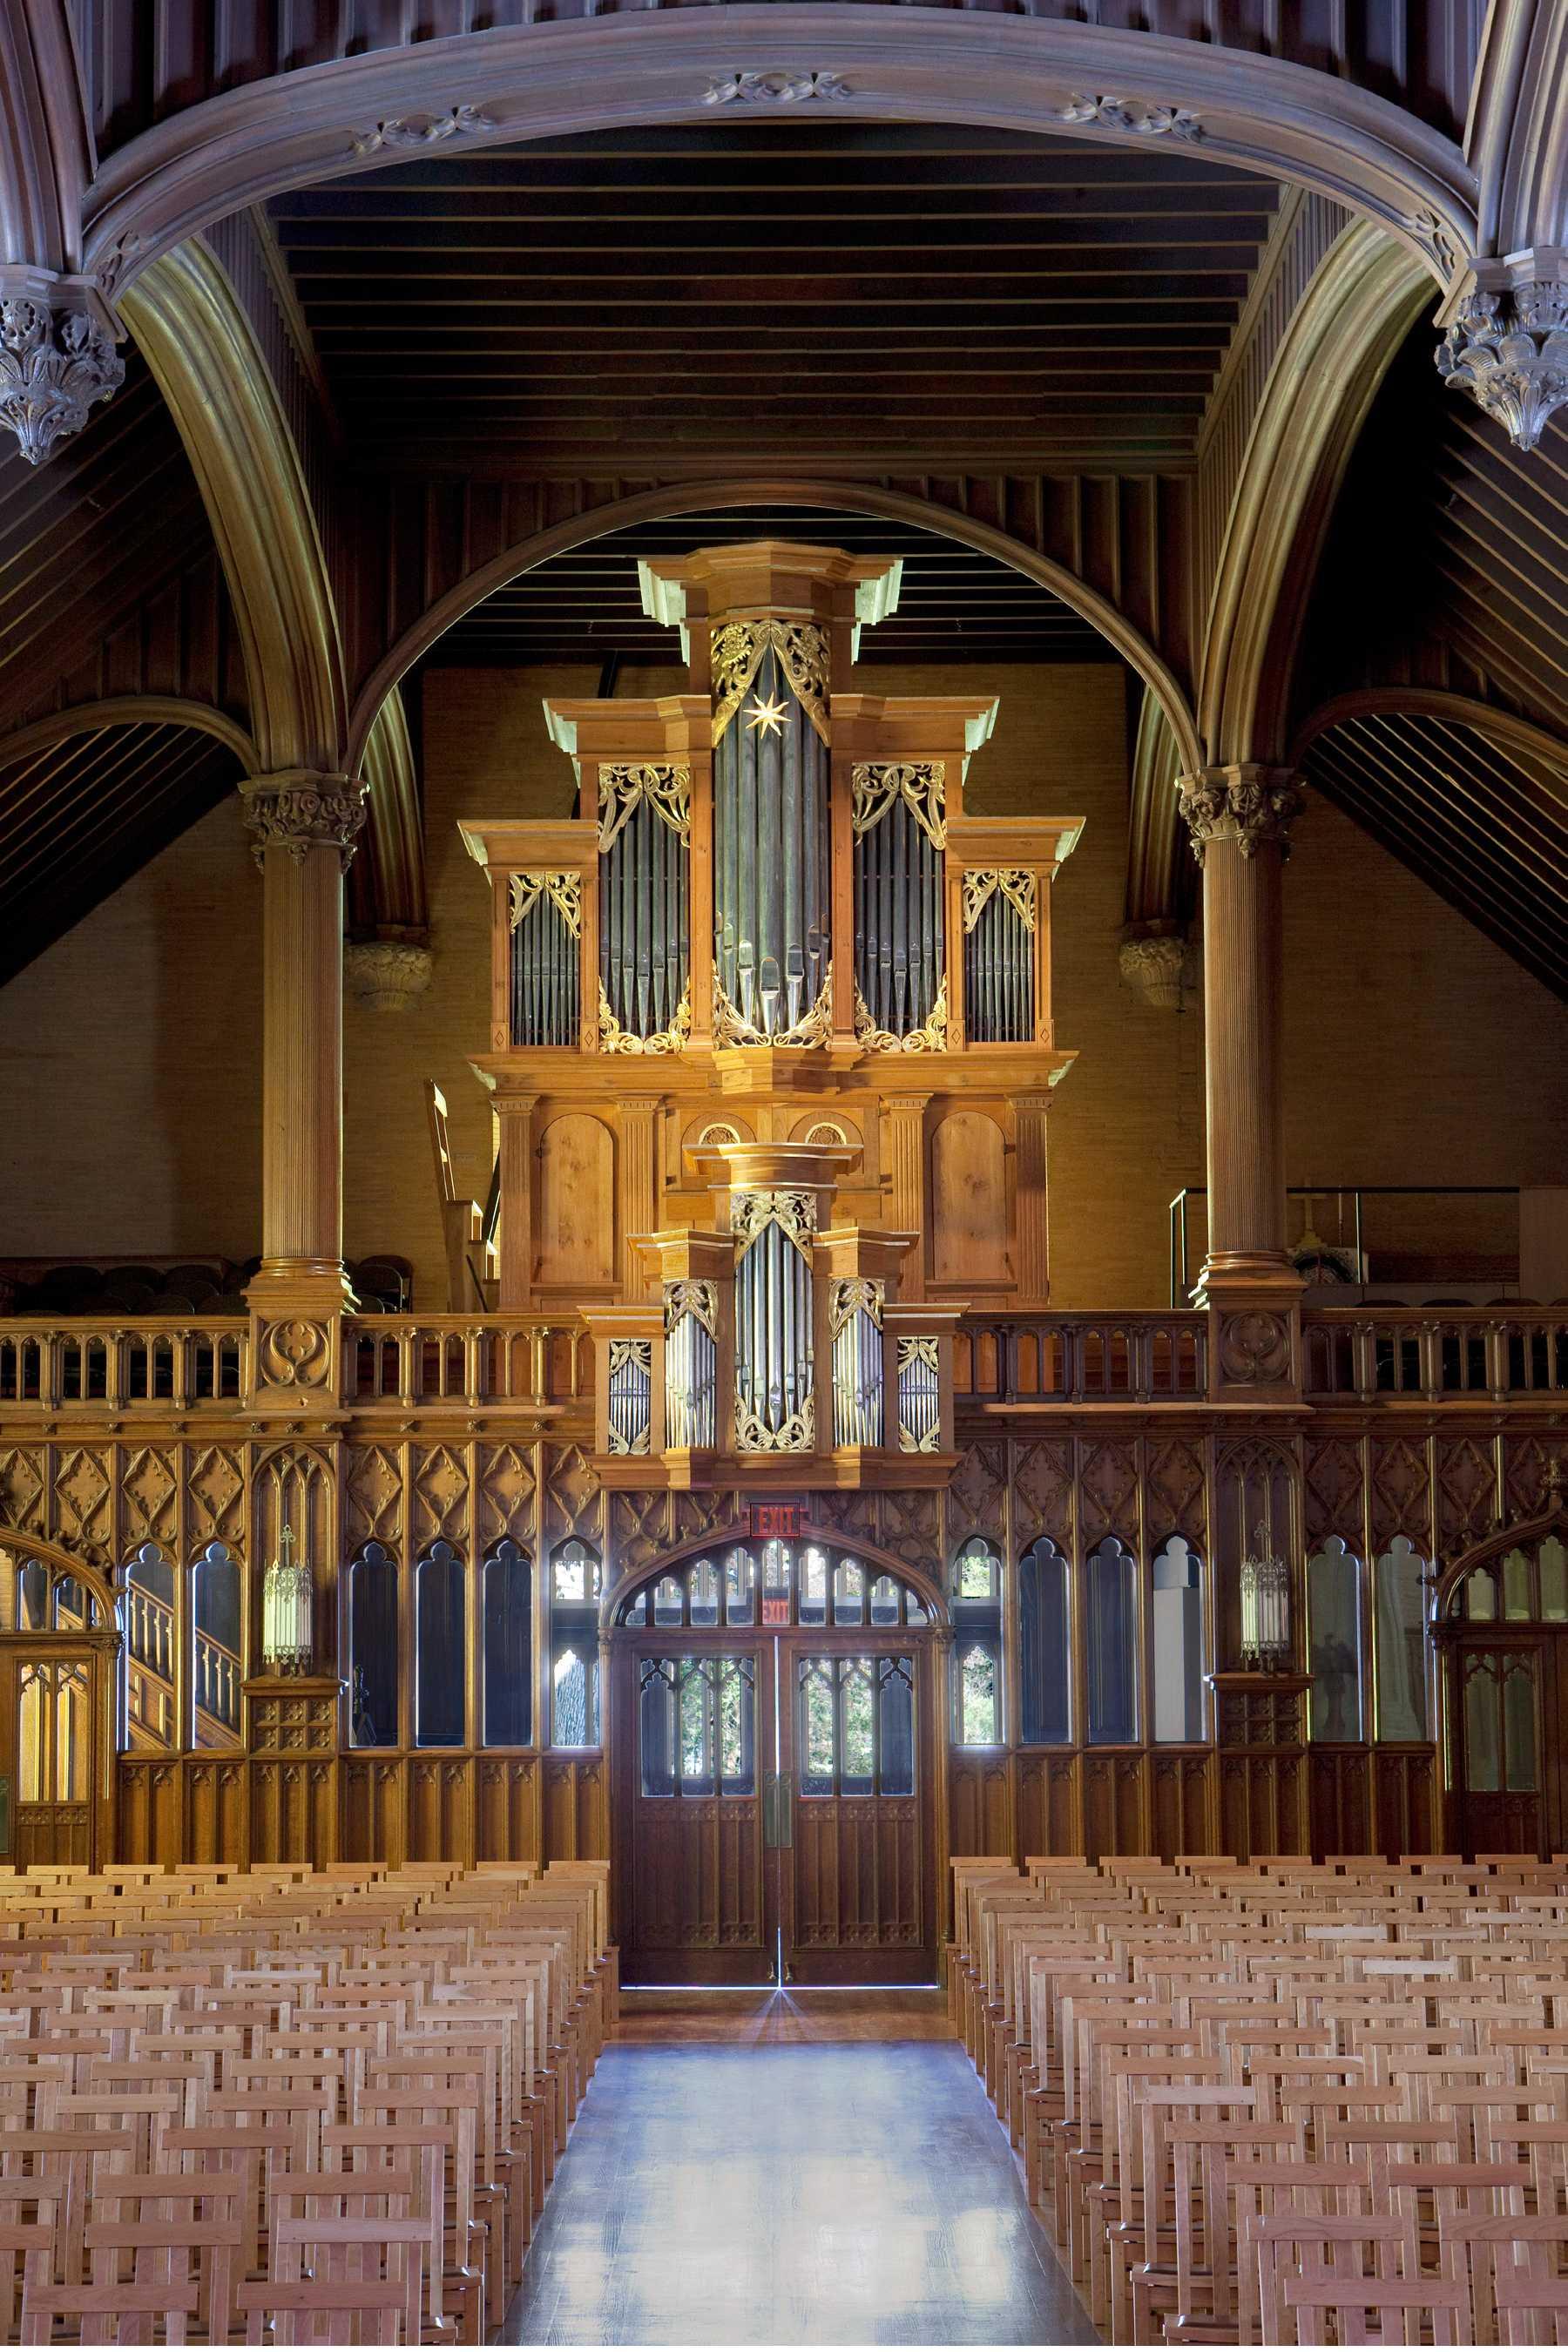 Houghton Chapel, Wellesley College